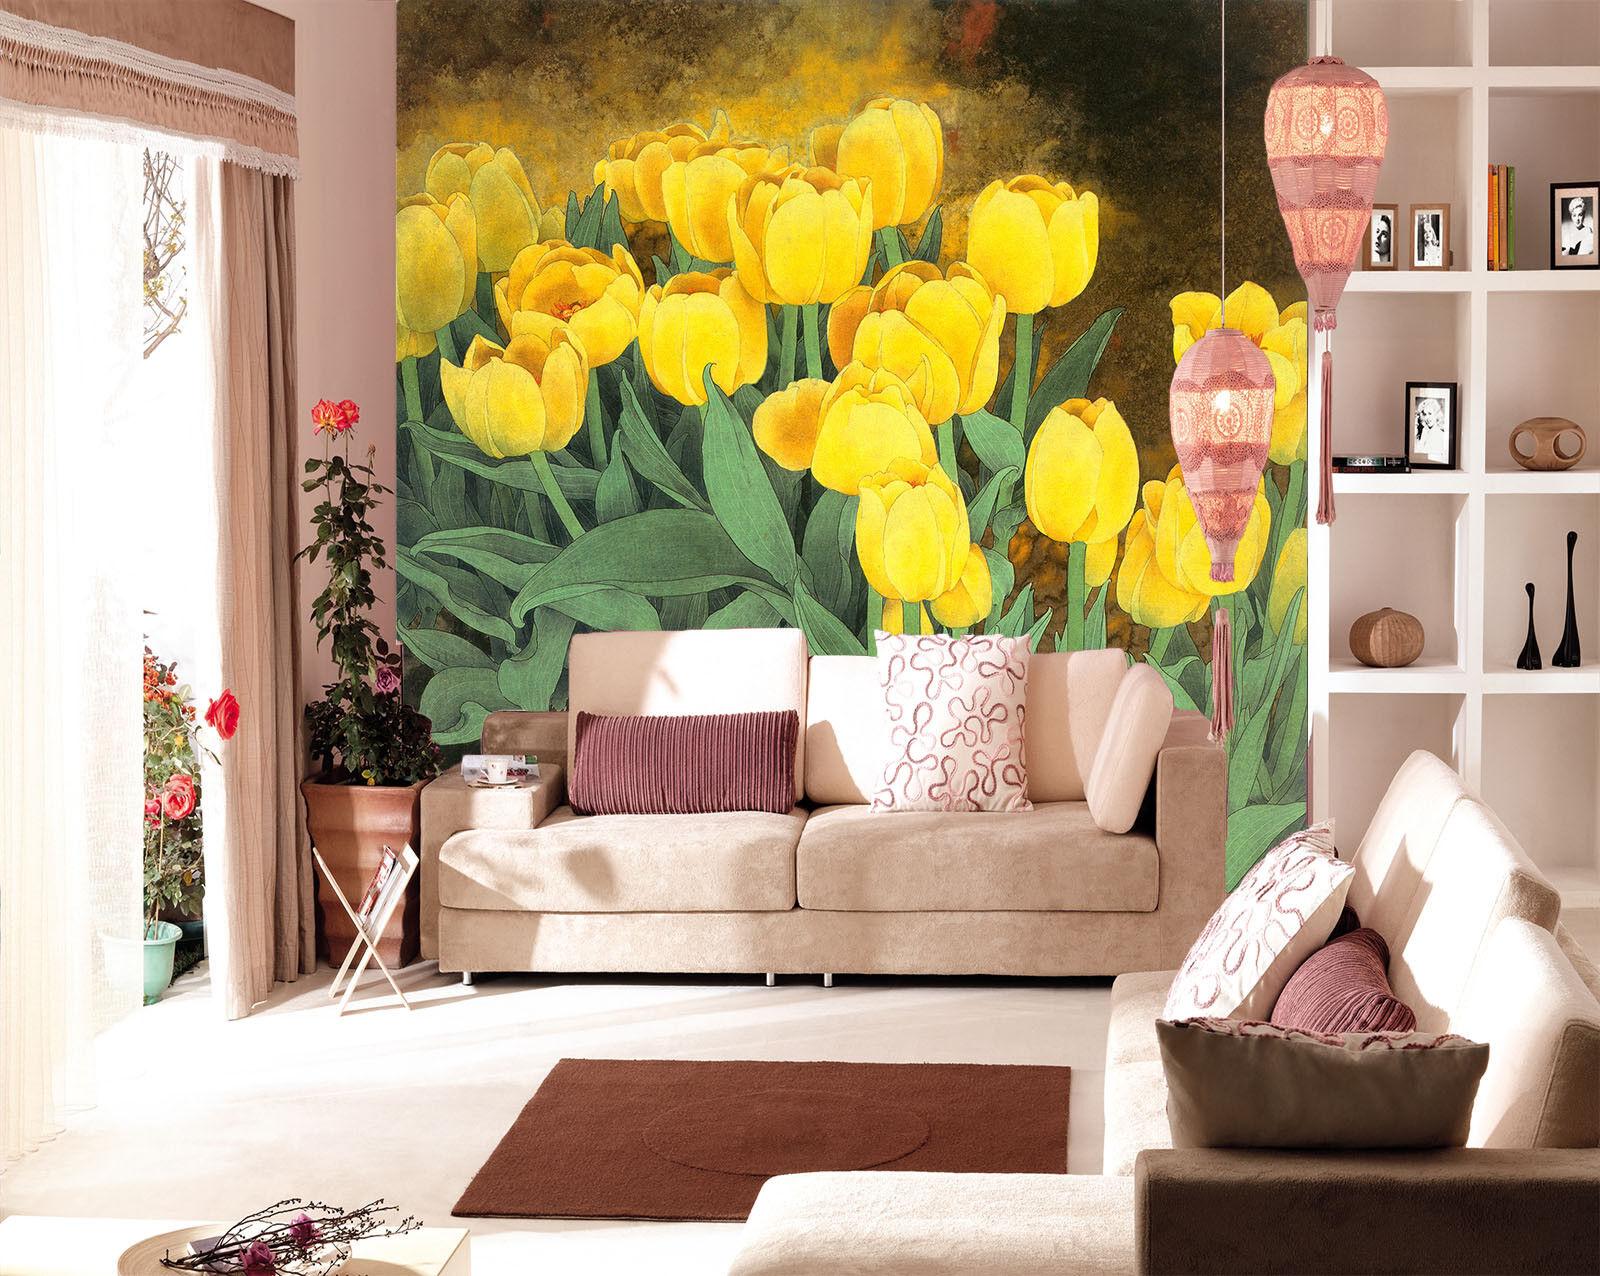 3D Golden Tulip Blaumenfeld 74 Tapete Wandgemälde Tapete Tapeten Bild Familie DE | Outlet  | Schnelle Lieferung  | Neues Design